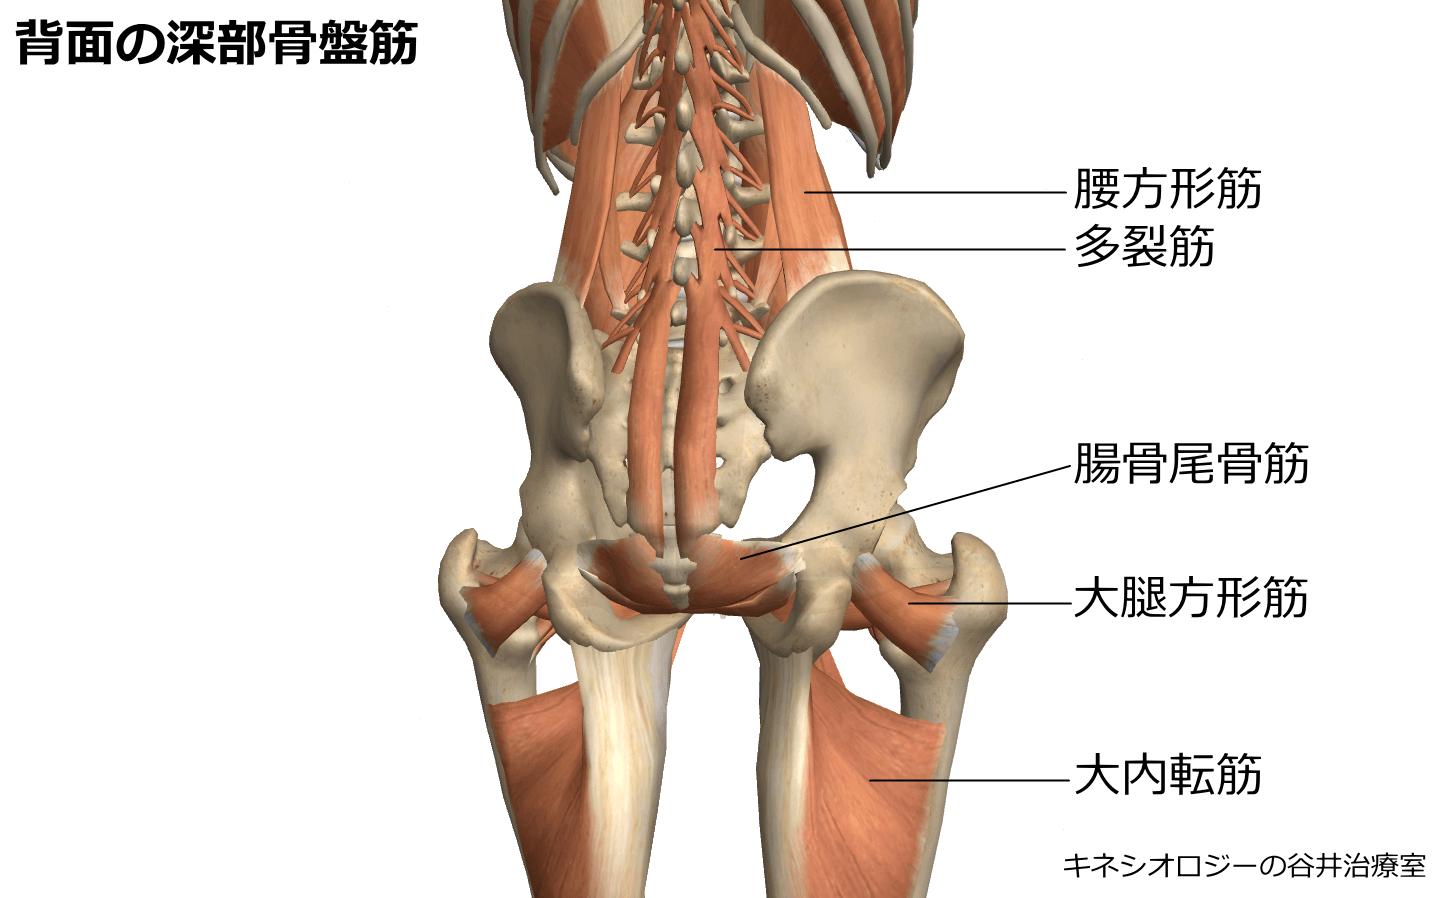 背面の深部骨盤筋肉